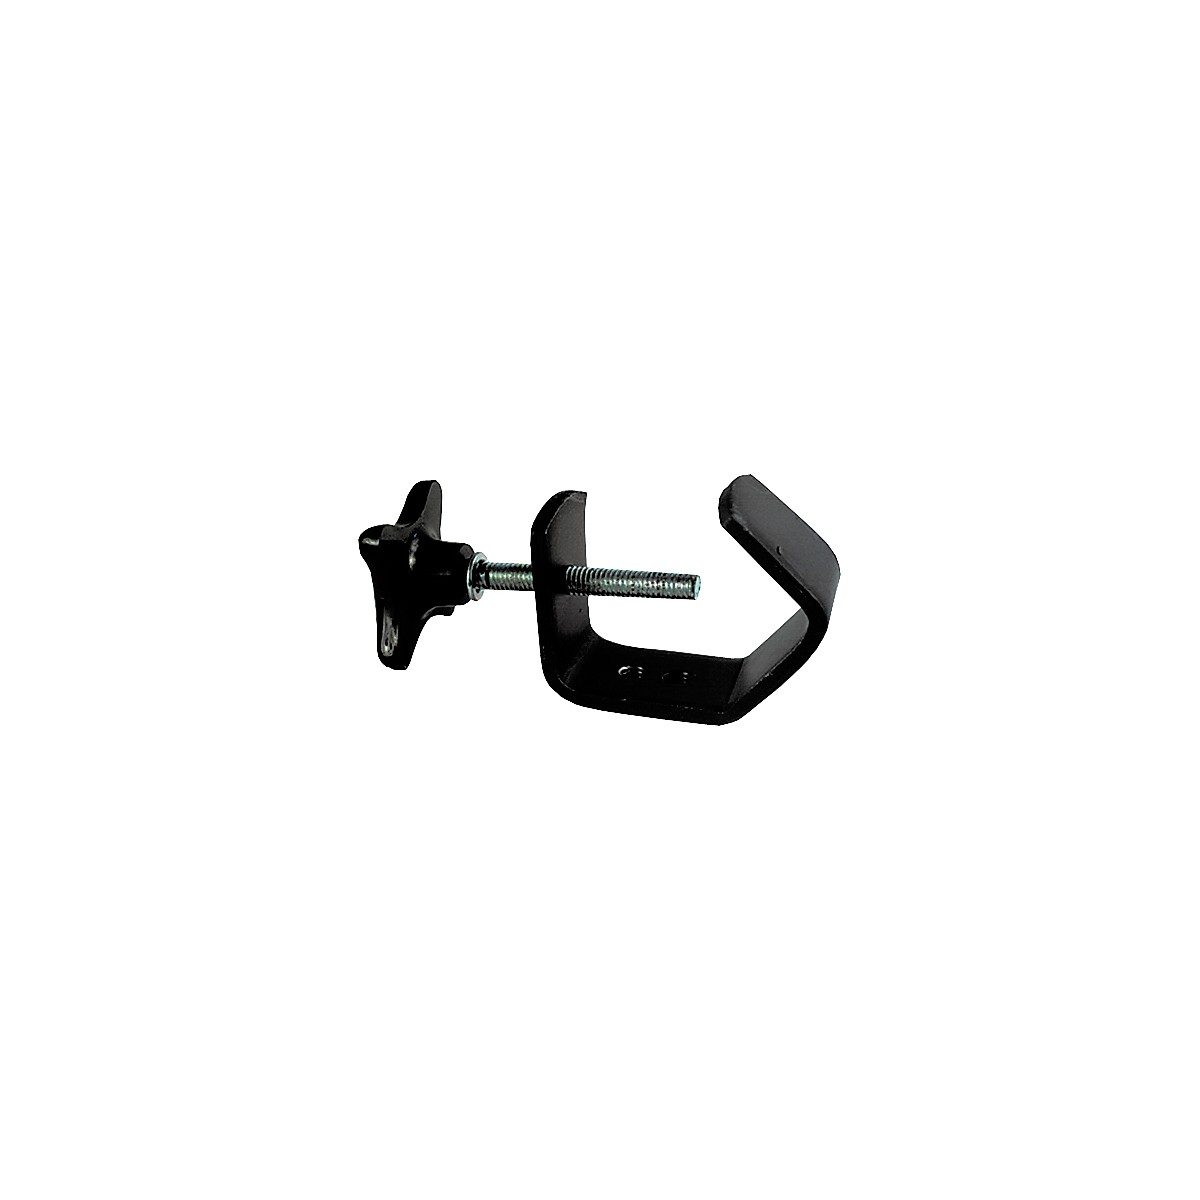 CHAUVET DJ CLP-02 Adjustable Steel C-Clamp for DJ/Lighting Use